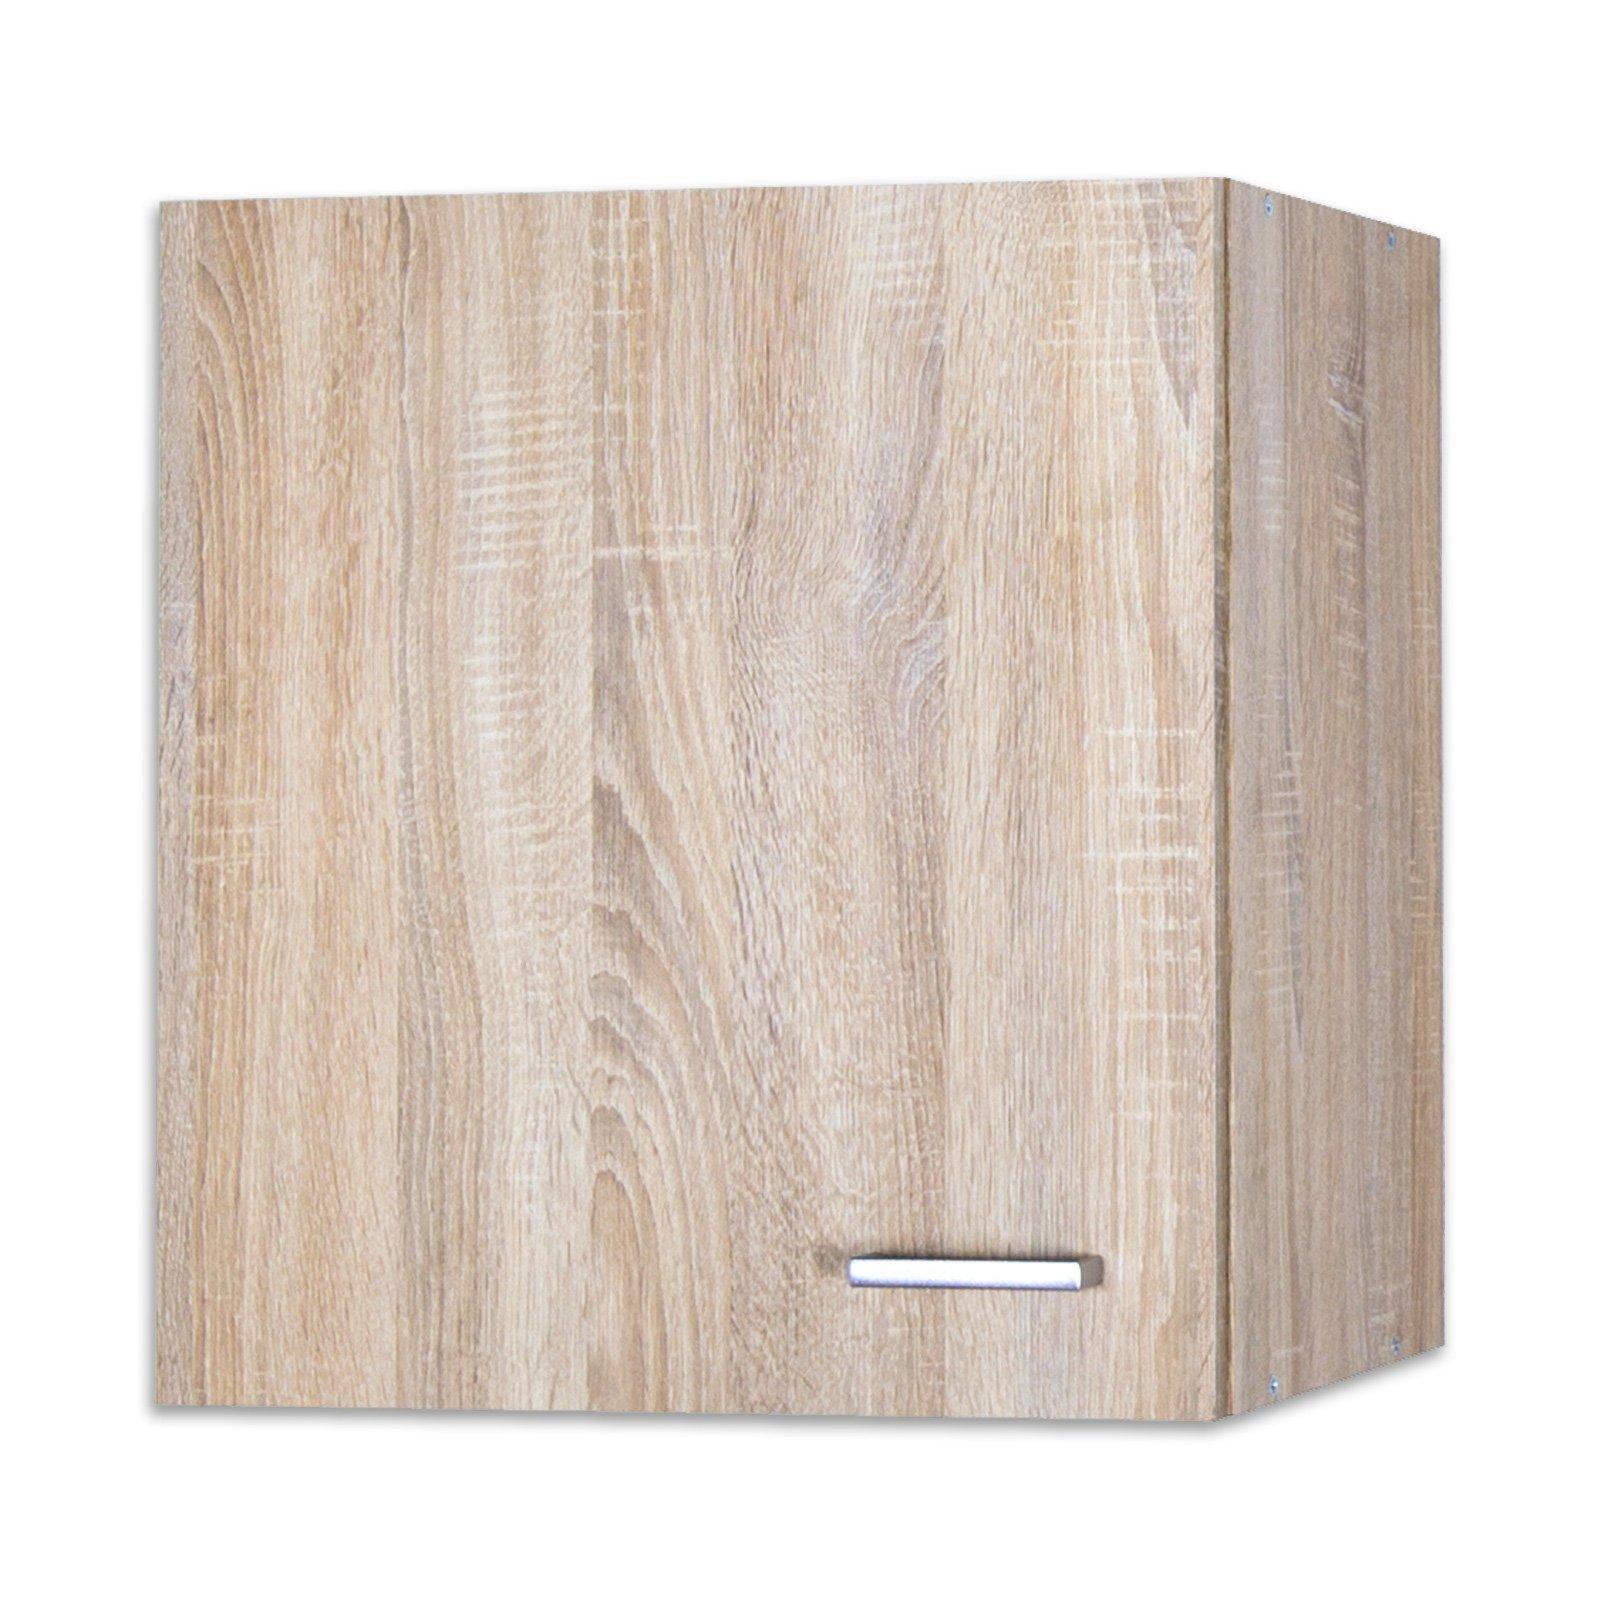 h ngeschrank sinja sonoma eiche 50x35 cm. Black Bedroom Furniture Sets. Home Design Ideas